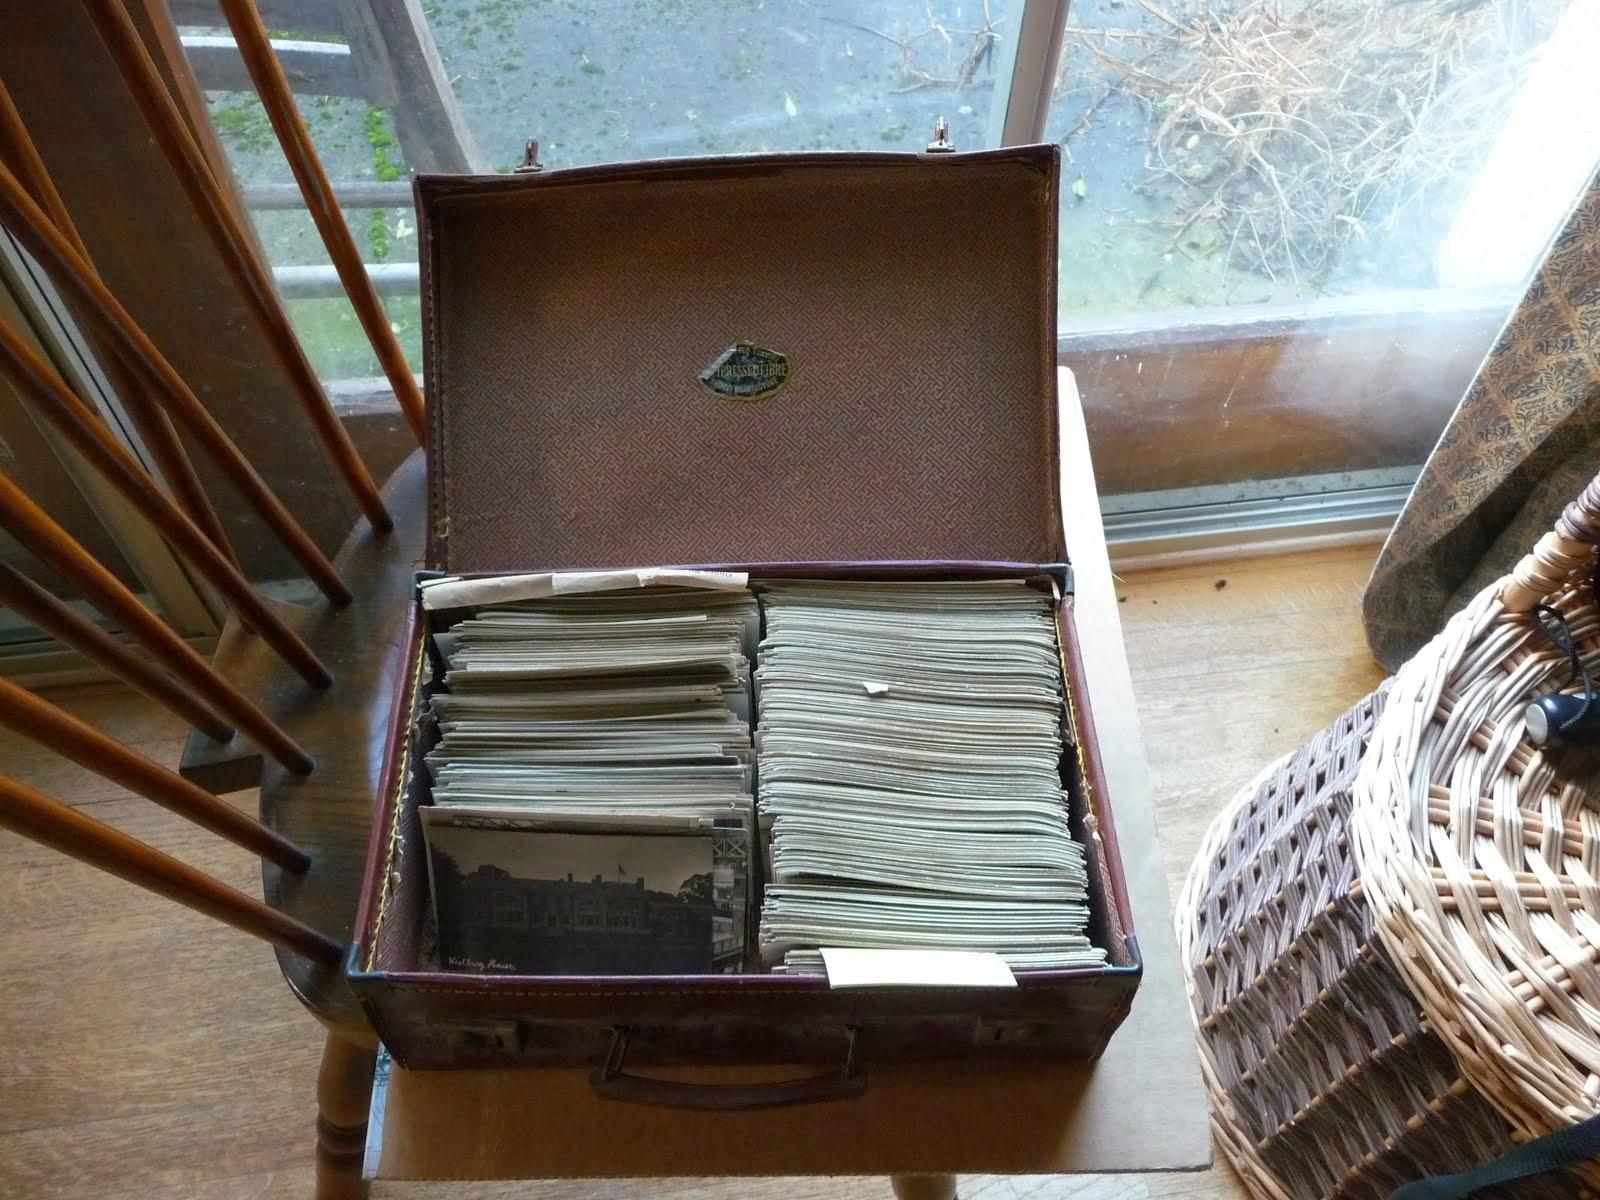 A suitcase archive